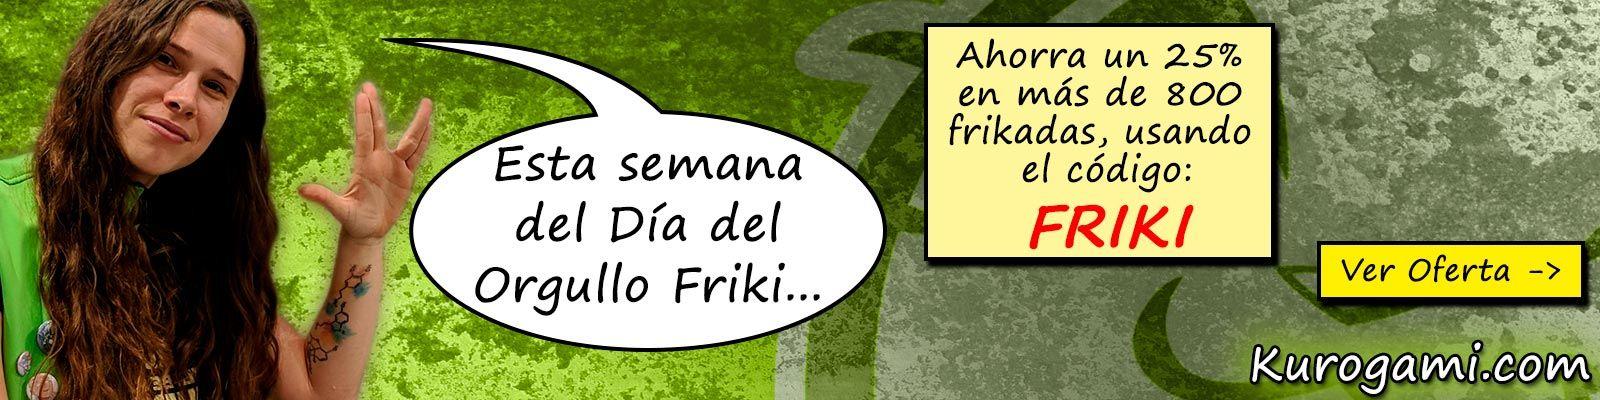 Promocion_Orgullo_Friki